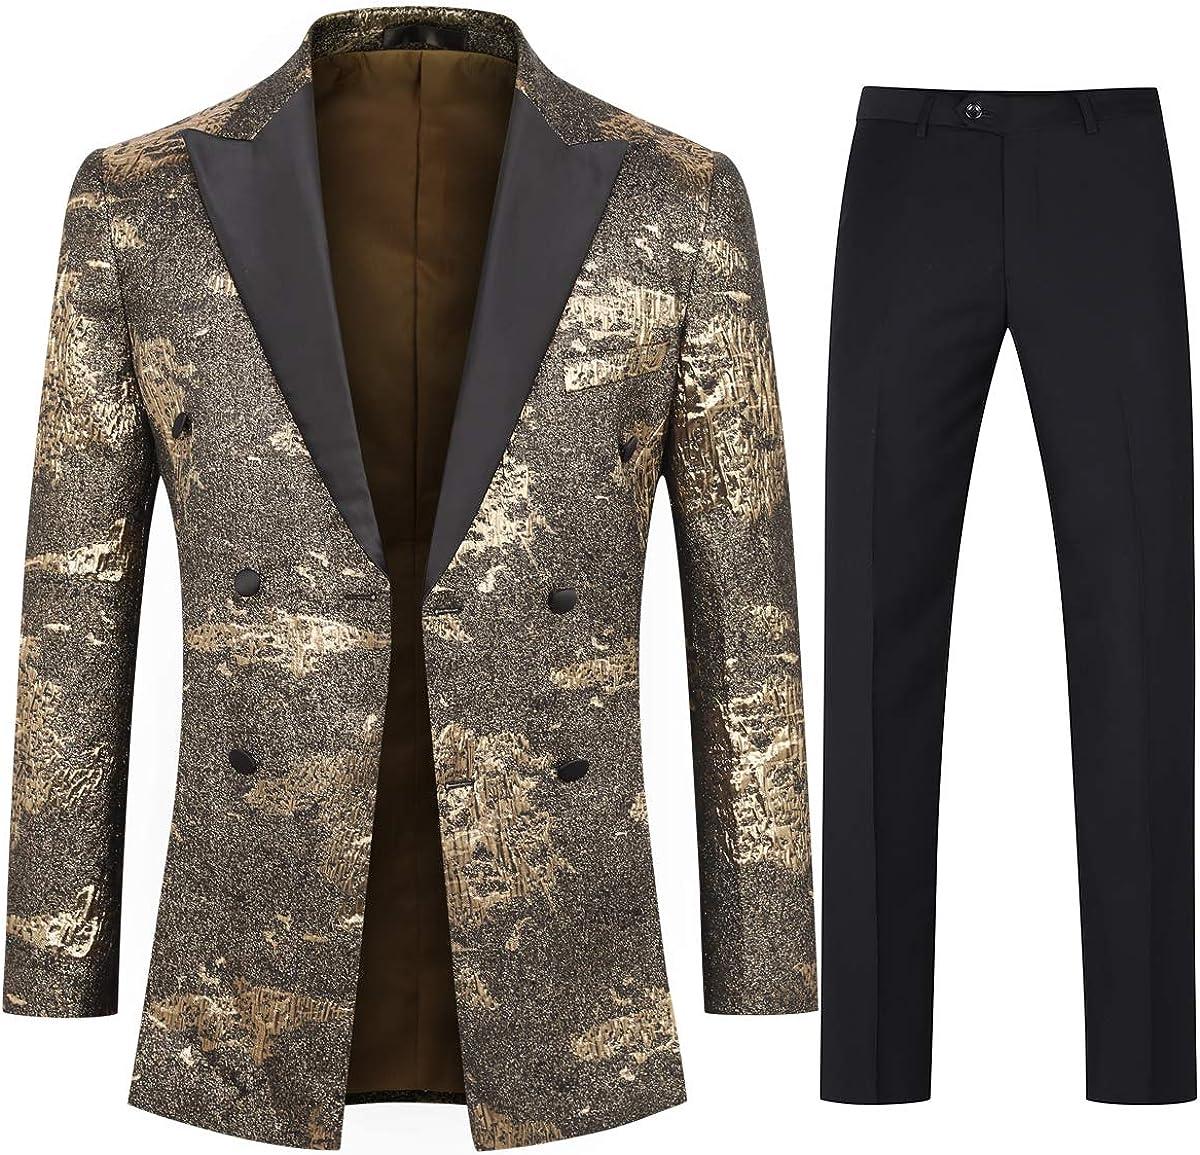 Boyland Men's Tuxedo Suits 2 Pieces Peak Lapel Double Breasted Golden Luxury Suit Jacket Pants